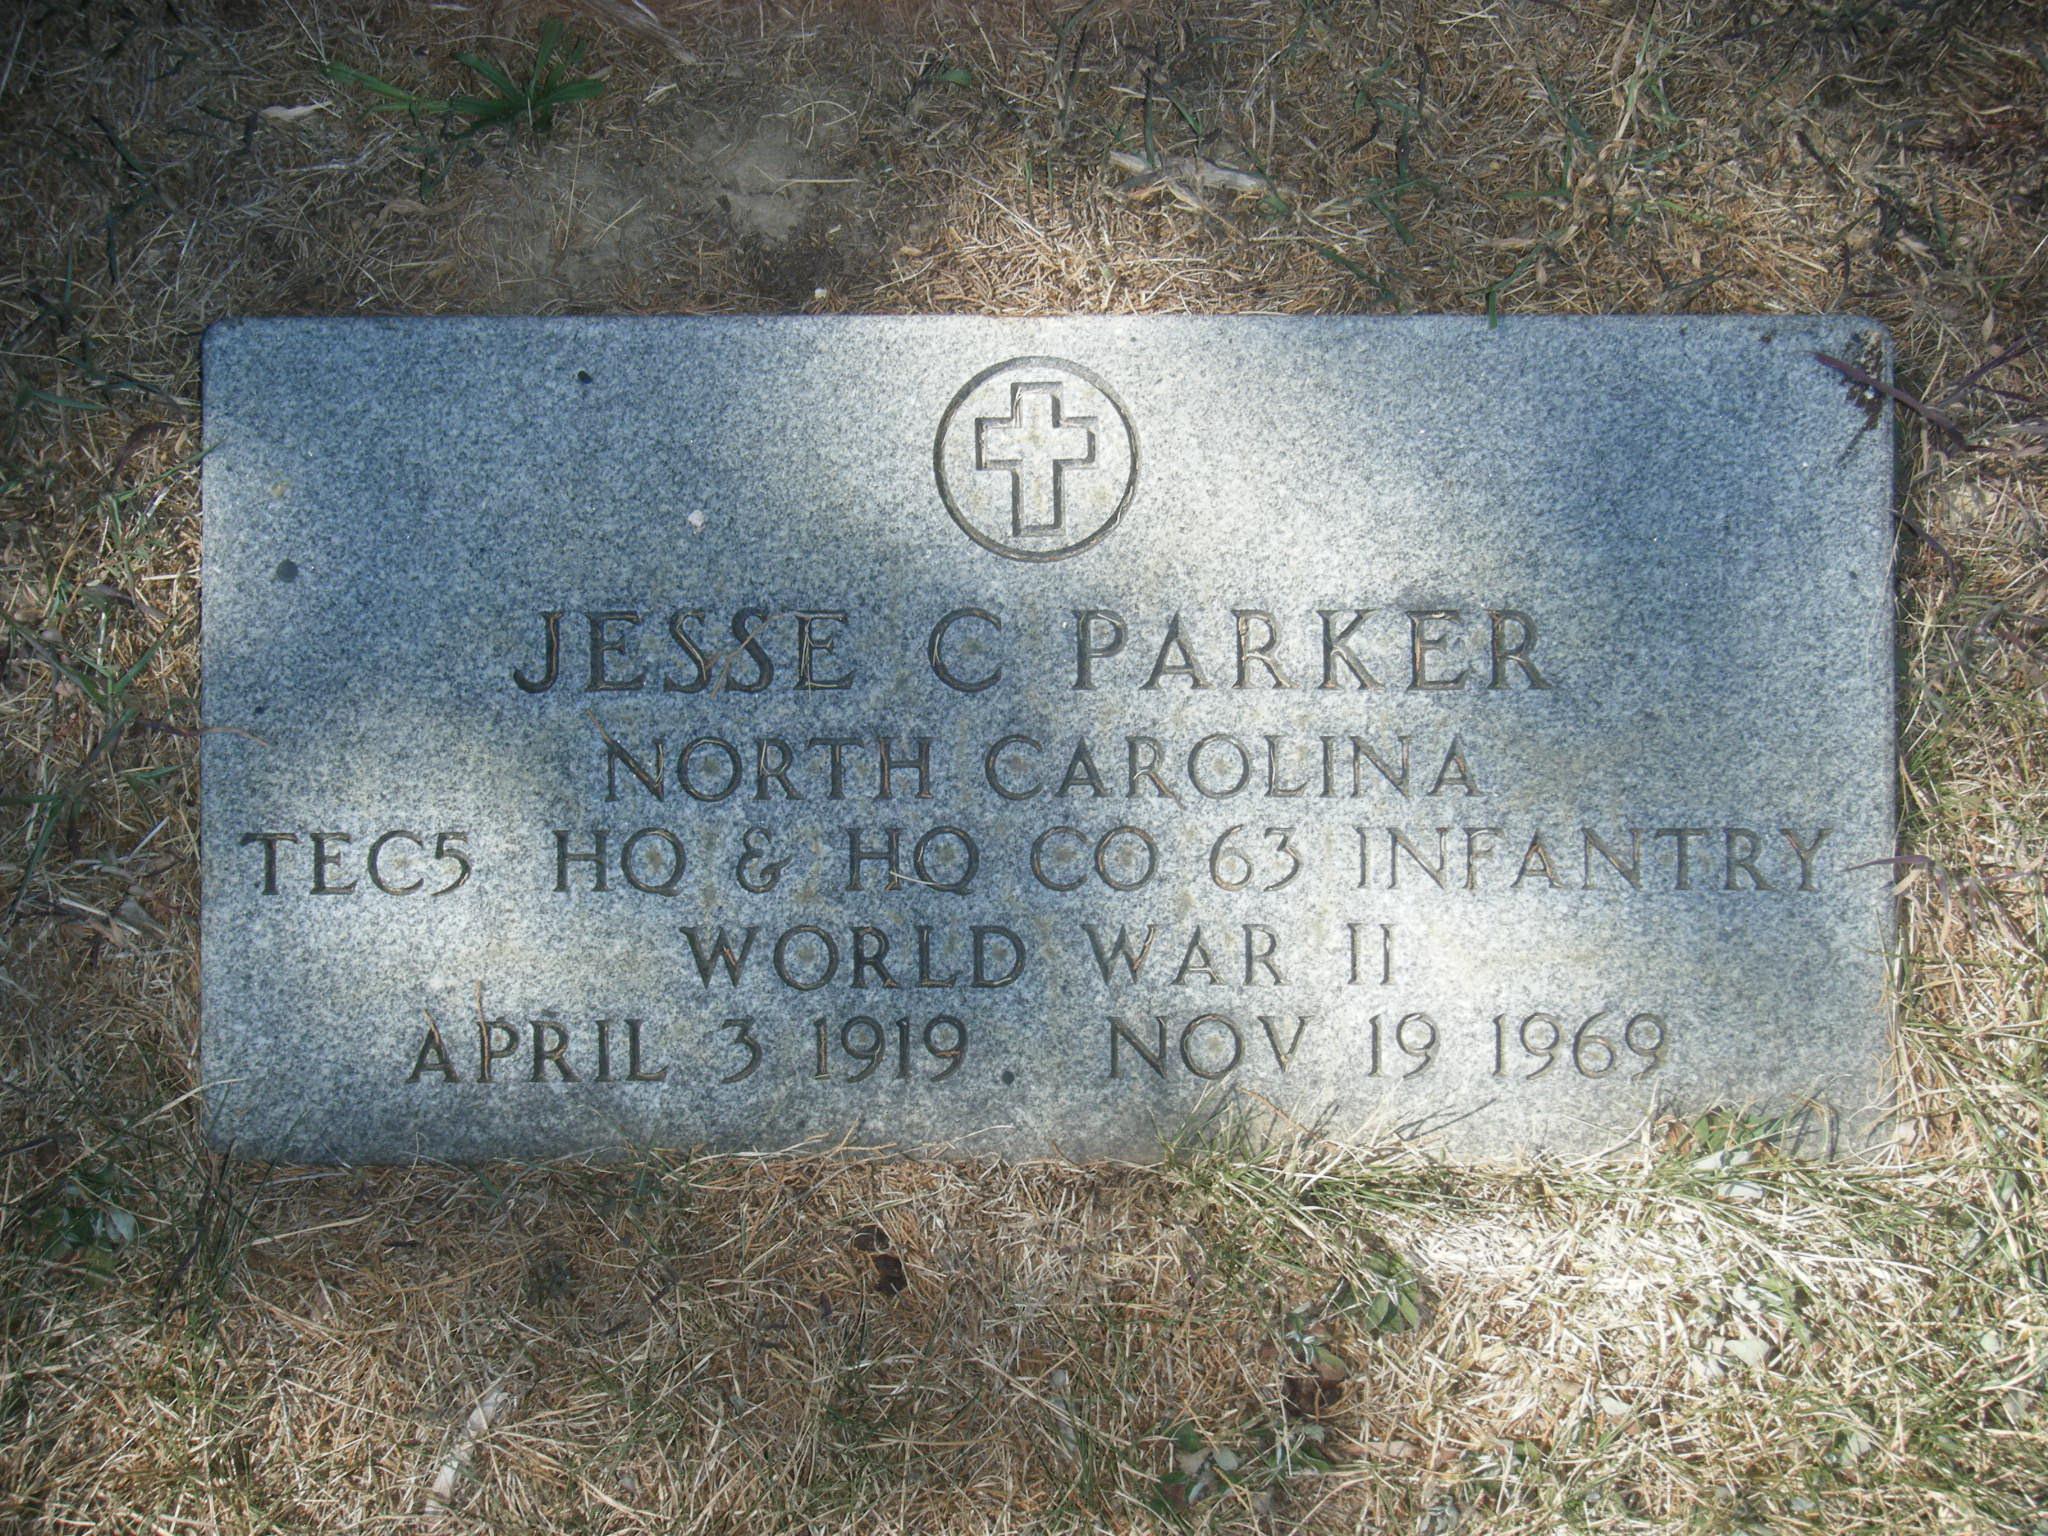 Jesse Calvin Parker